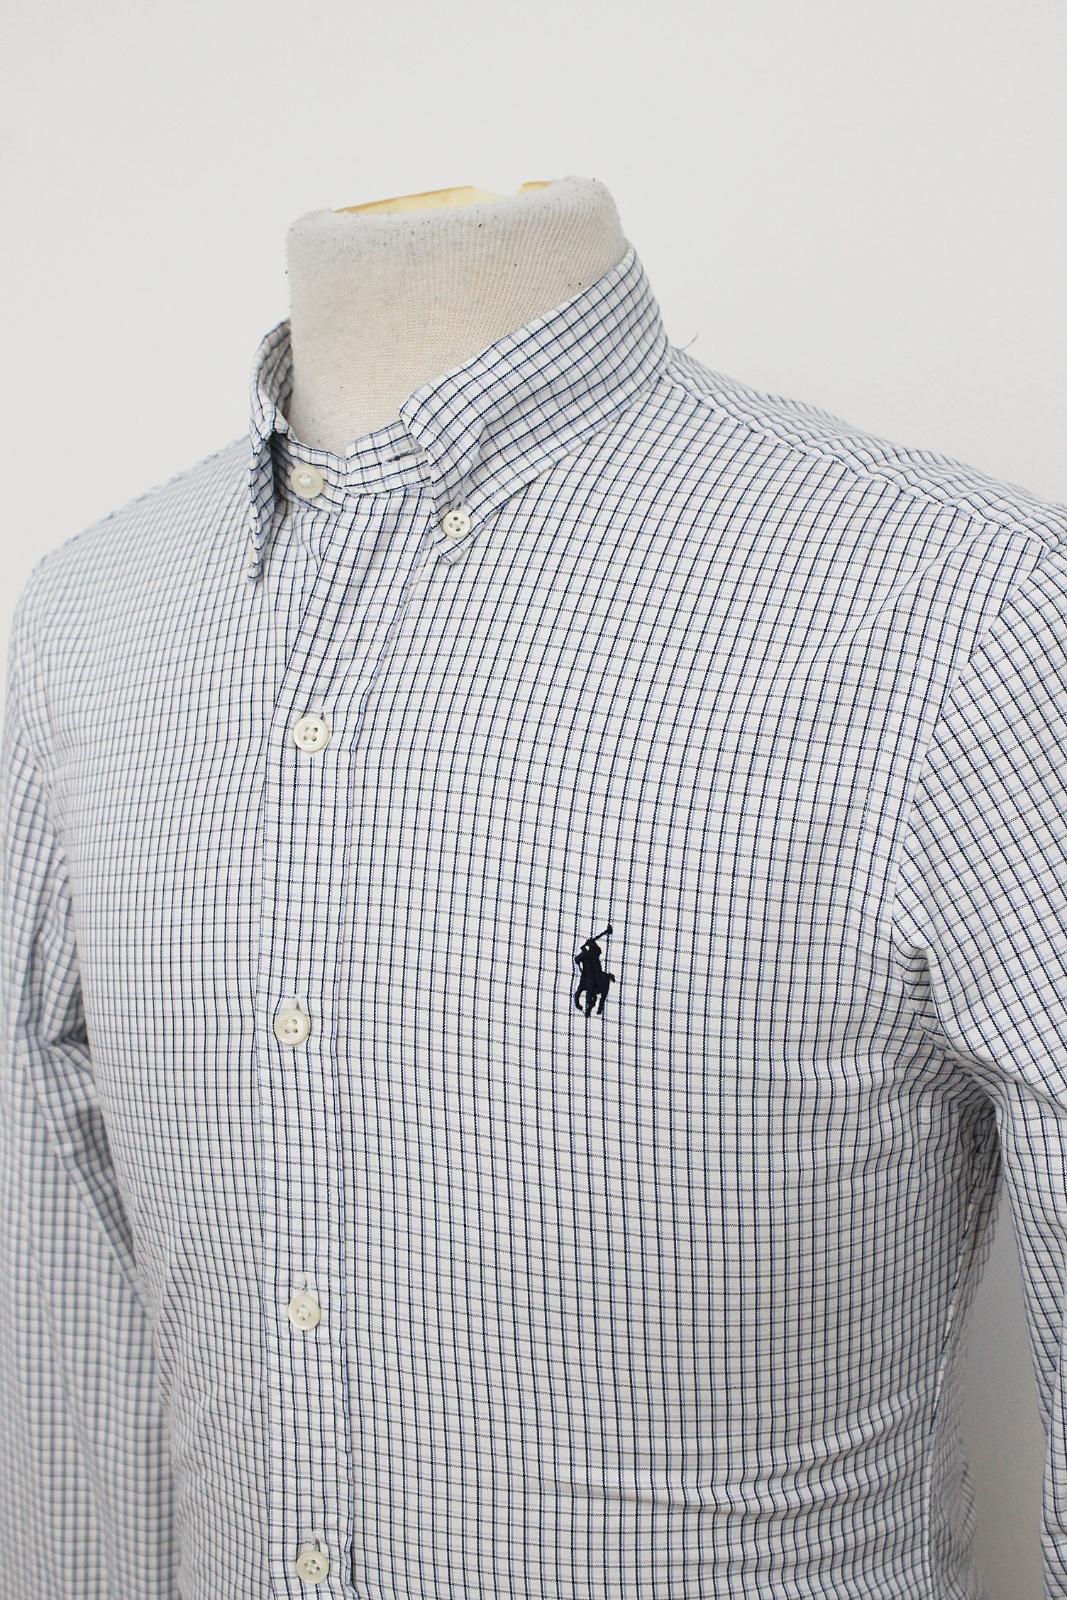 Polo-Ralph-Lauren-Para-Hombres-Blanco-Negro-Azul-Camisa-De-Patron-De-Cuadros-Slim-Fit-Talla-S miniatura 7